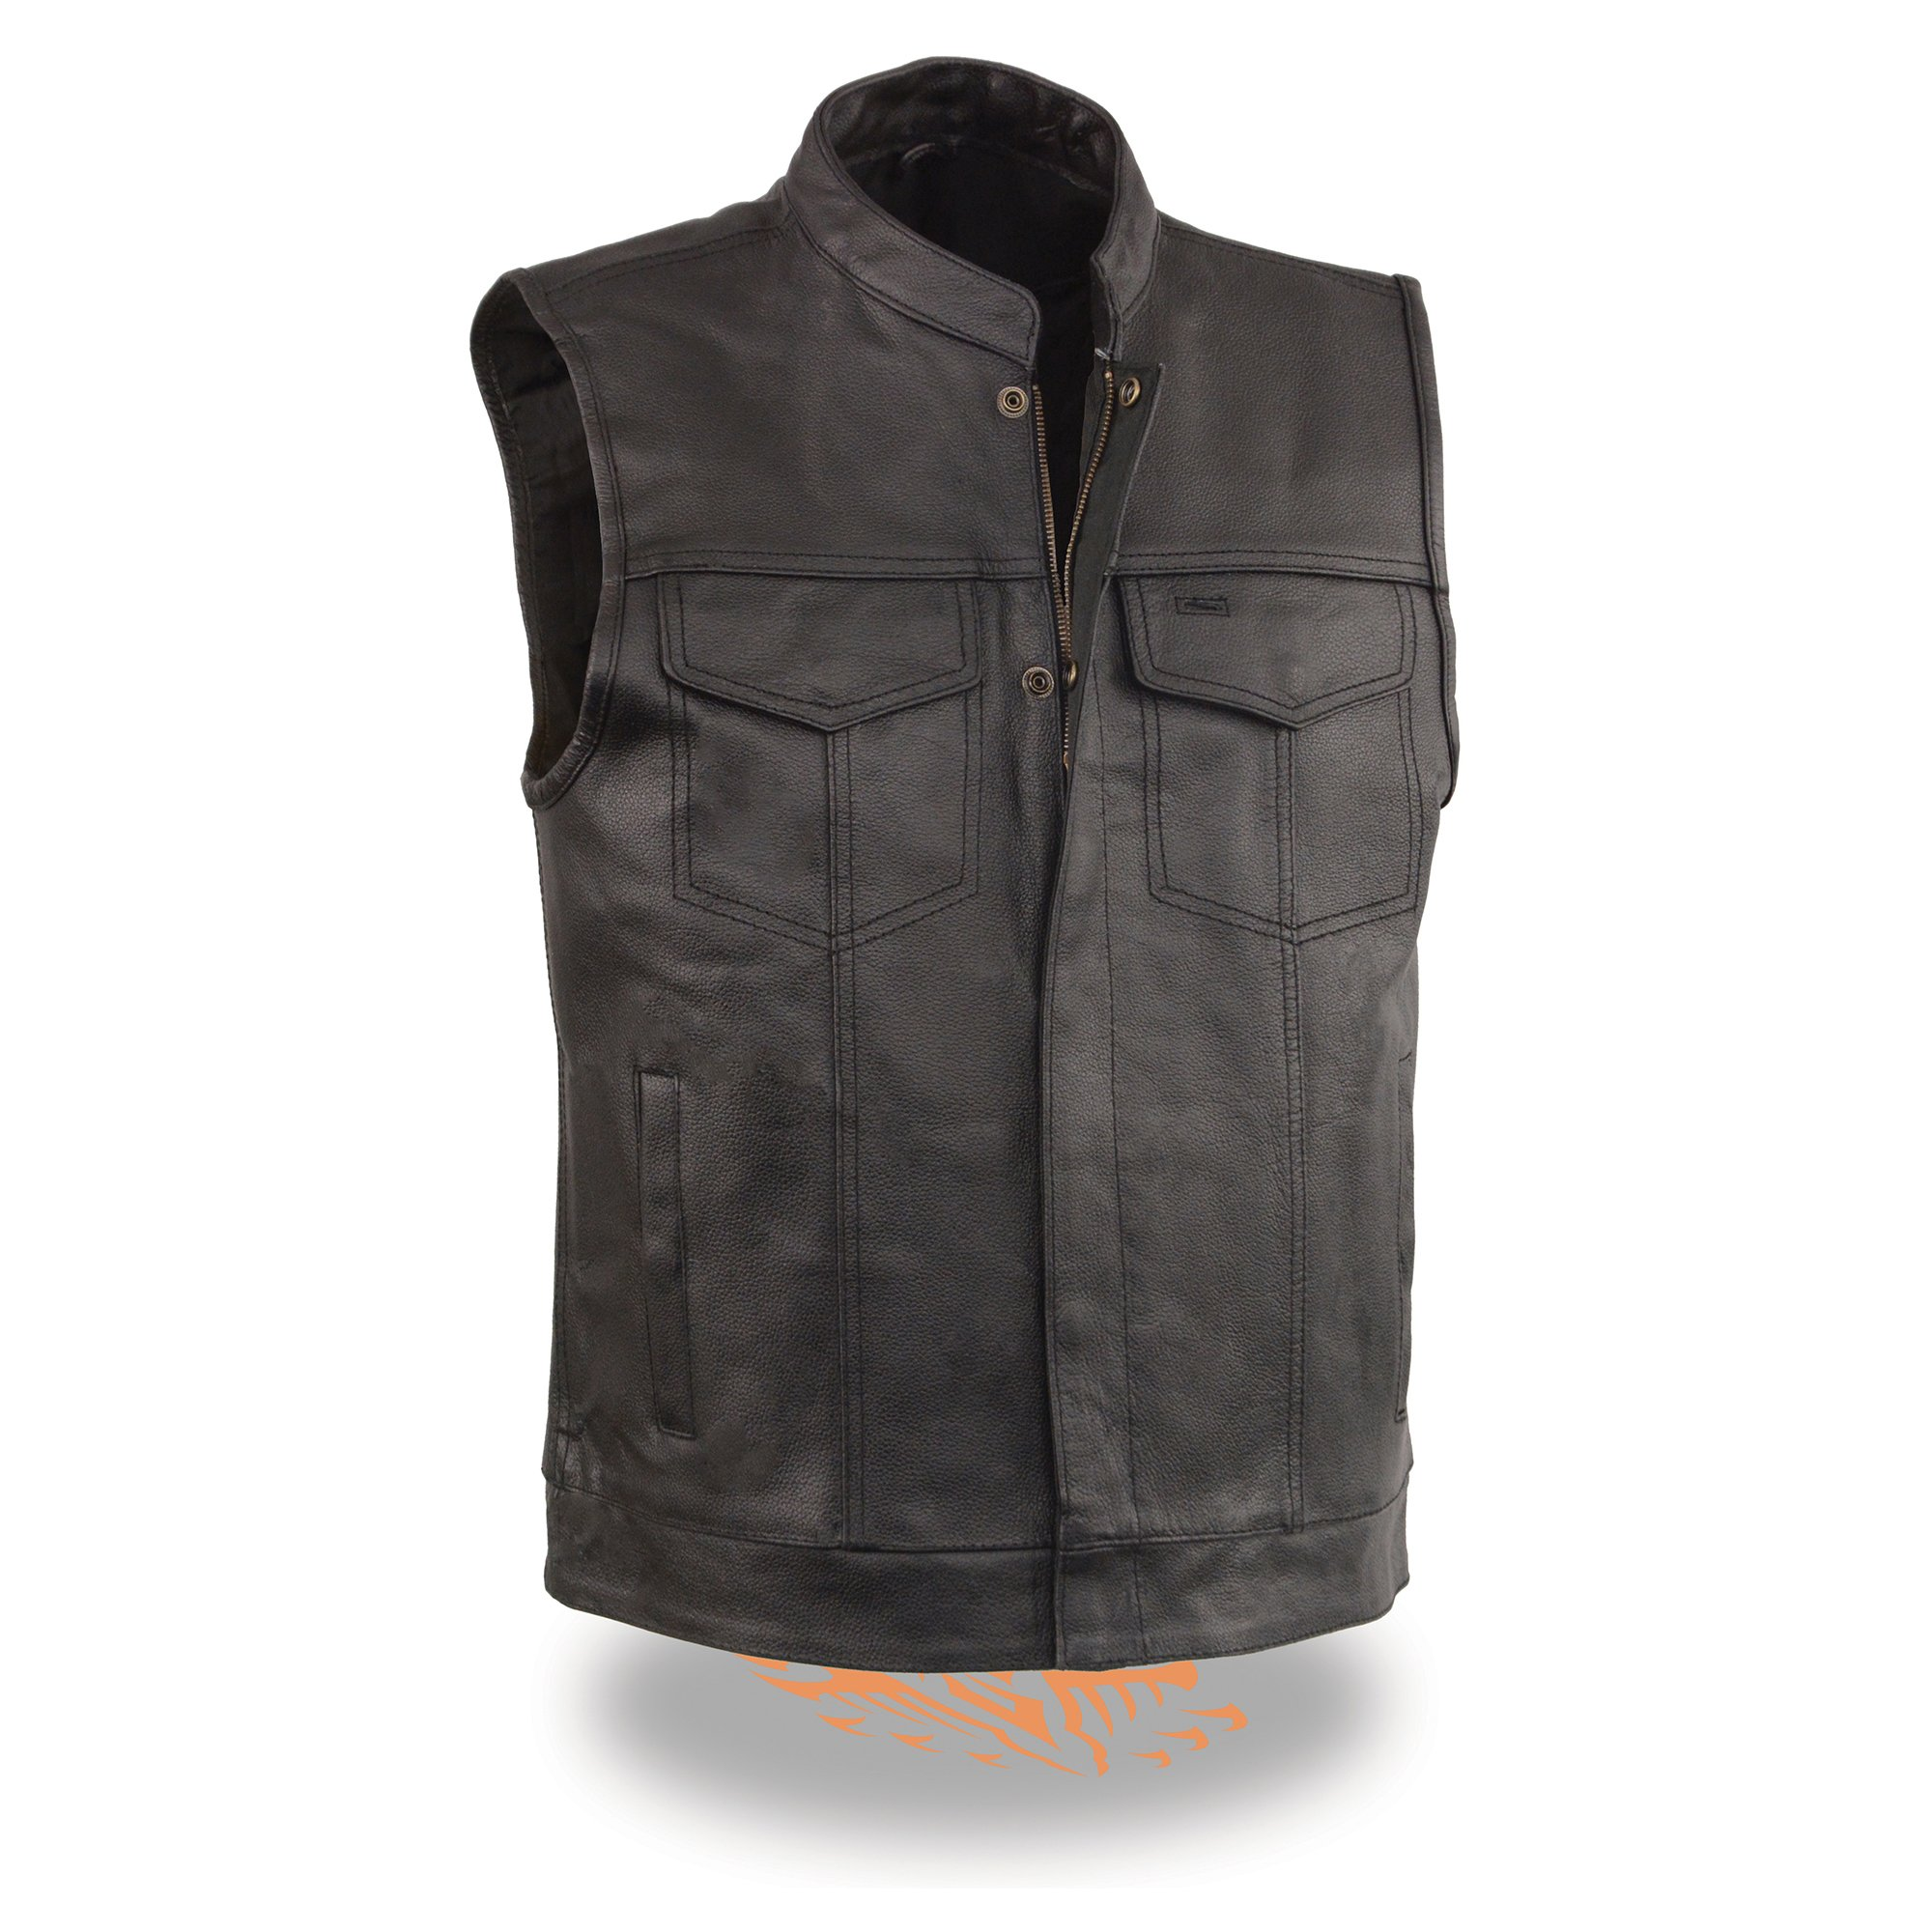 Men's Leather Motorcycle Vest Zipper & Snap Closure w/ 2 Inside Gun Pockets & Single Panel Back (5X - Big)